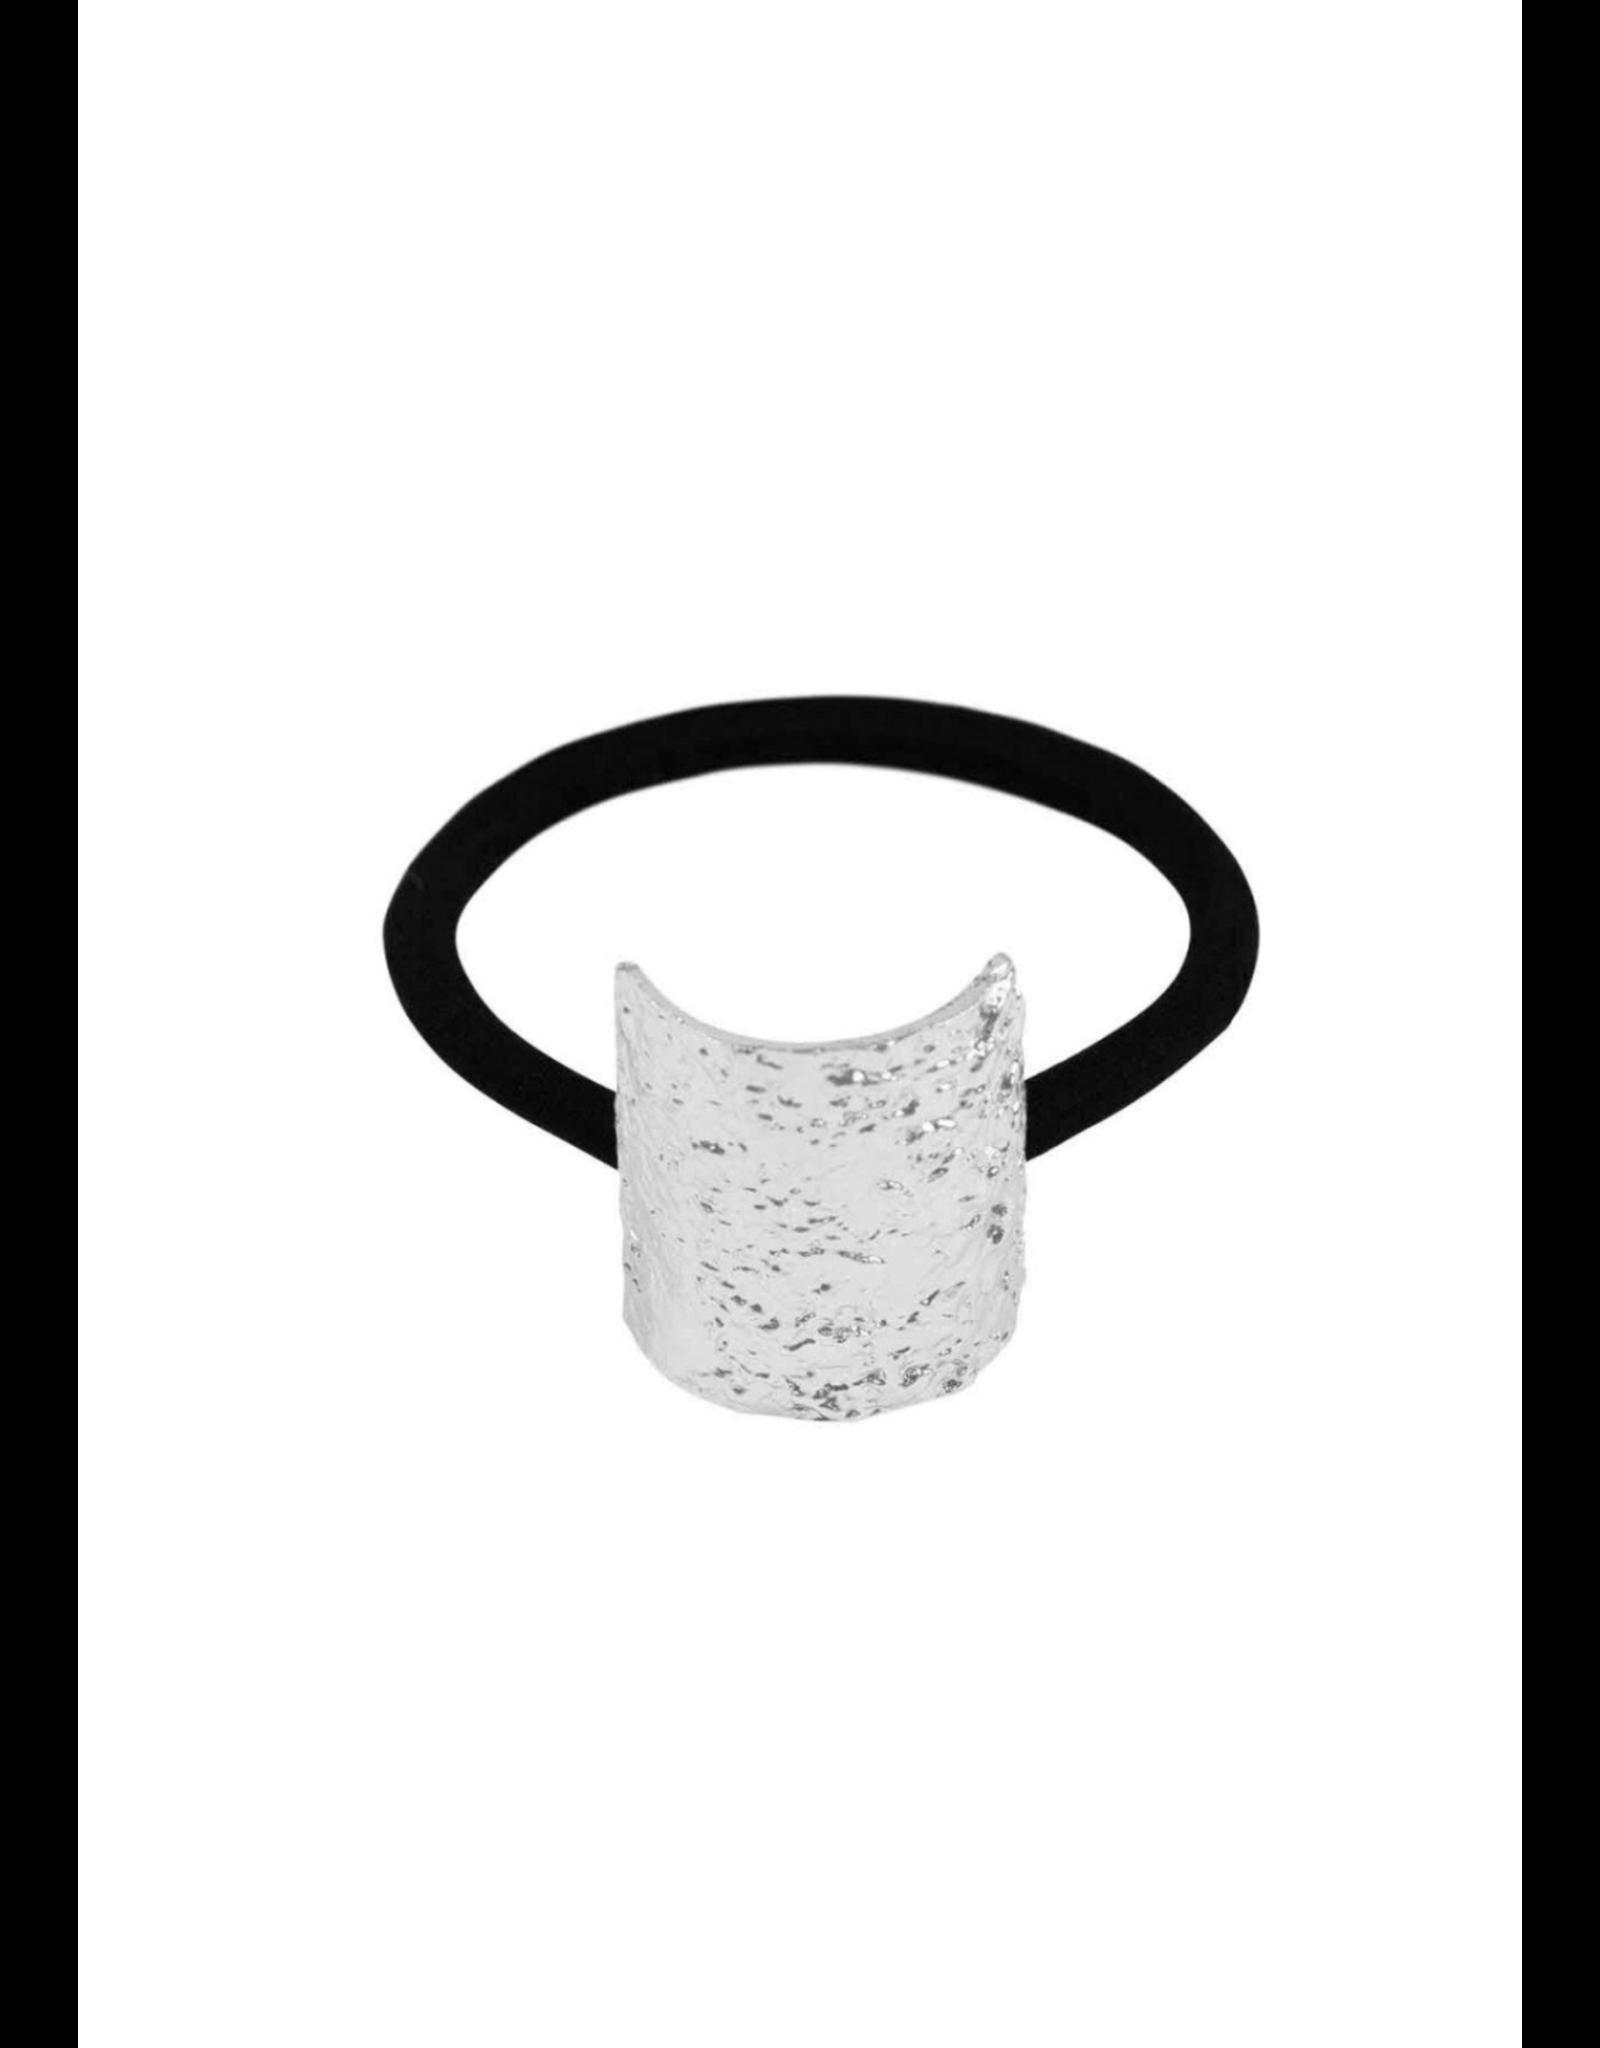 Dansk Dansk 4C3046 Textured Elastic Rhodium Plated